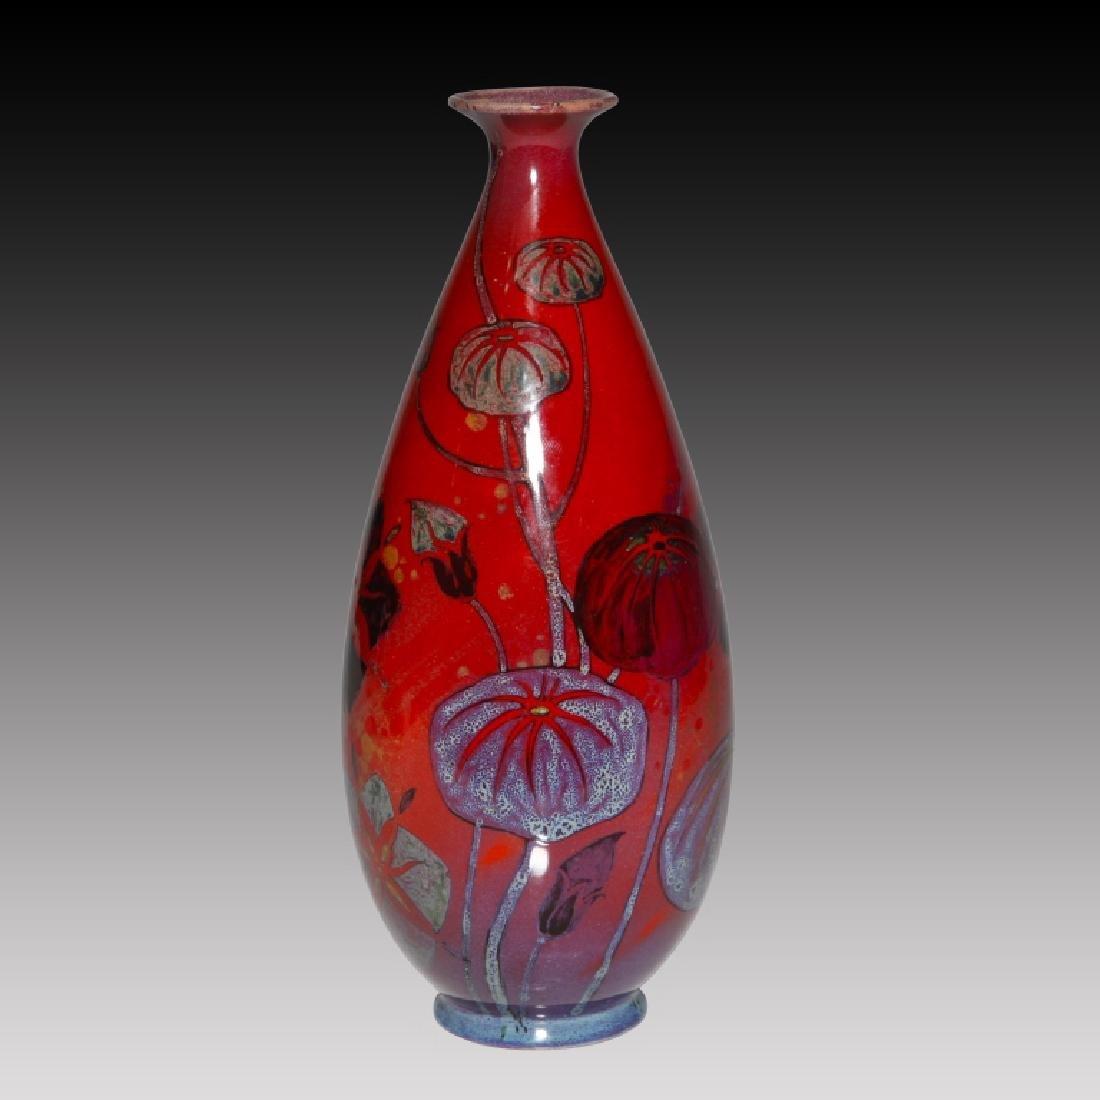 Doulton Sung Flambé Opium Poppy Vase